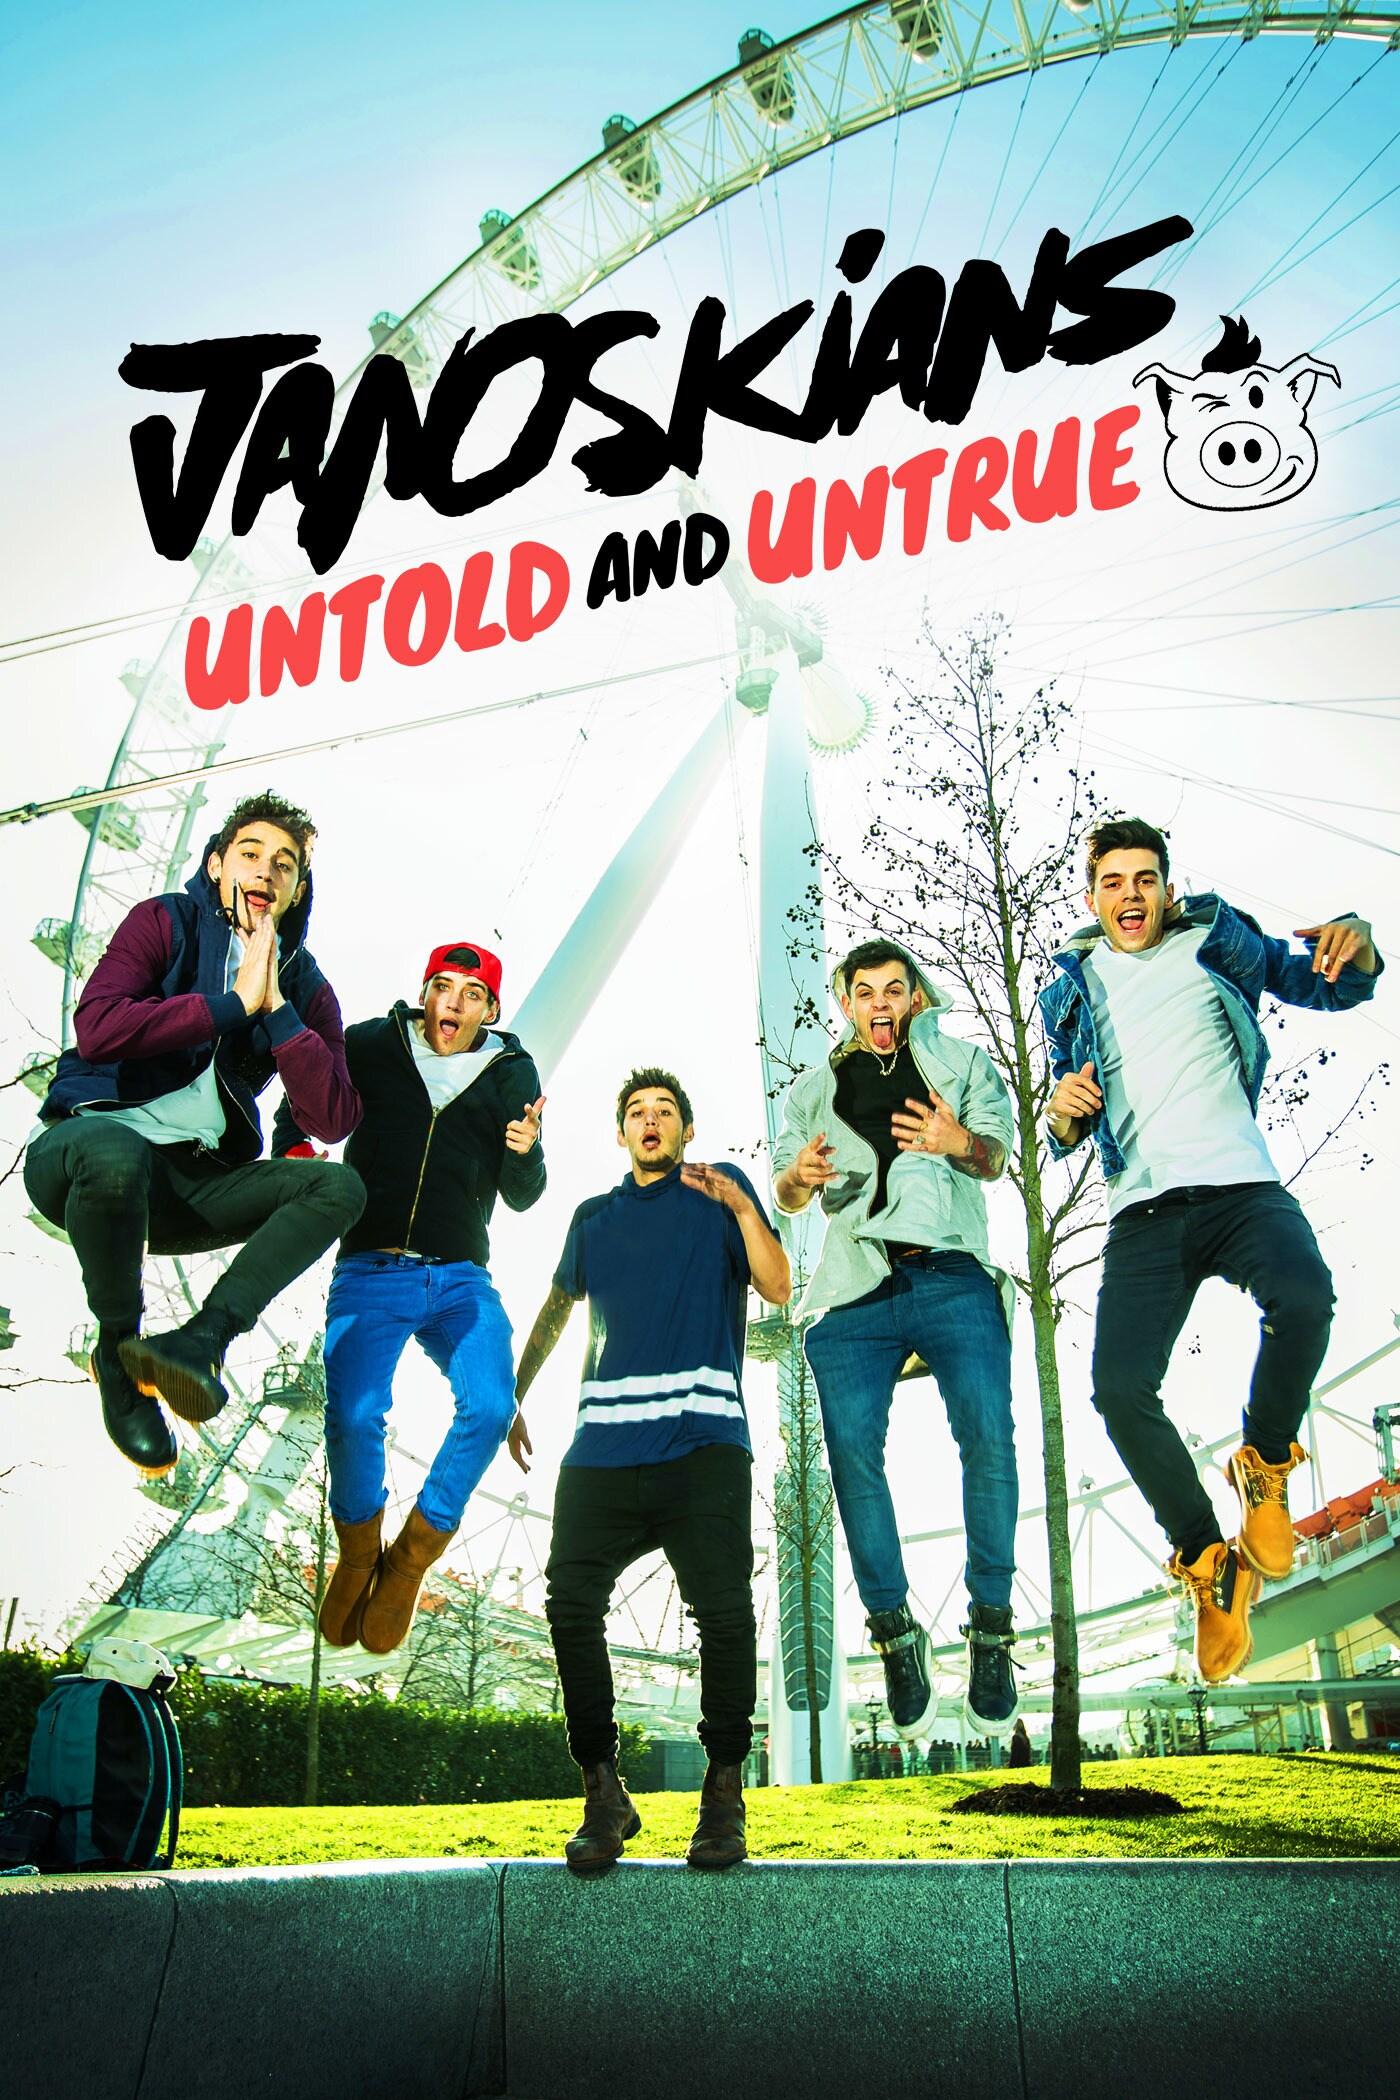 Janoskians: Untold and Untrue movie poster